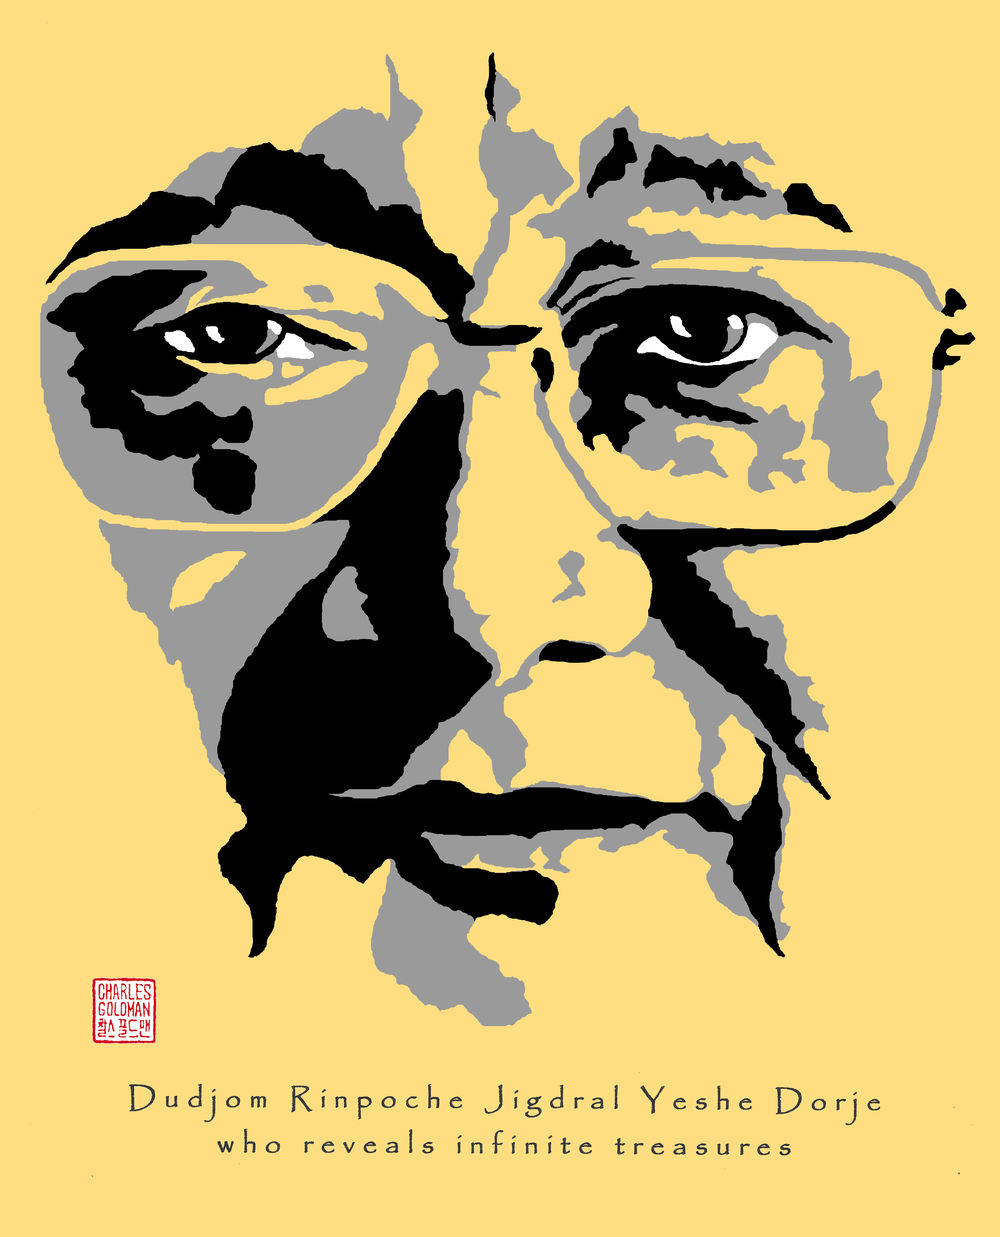 dudjom rinpoche Final.png